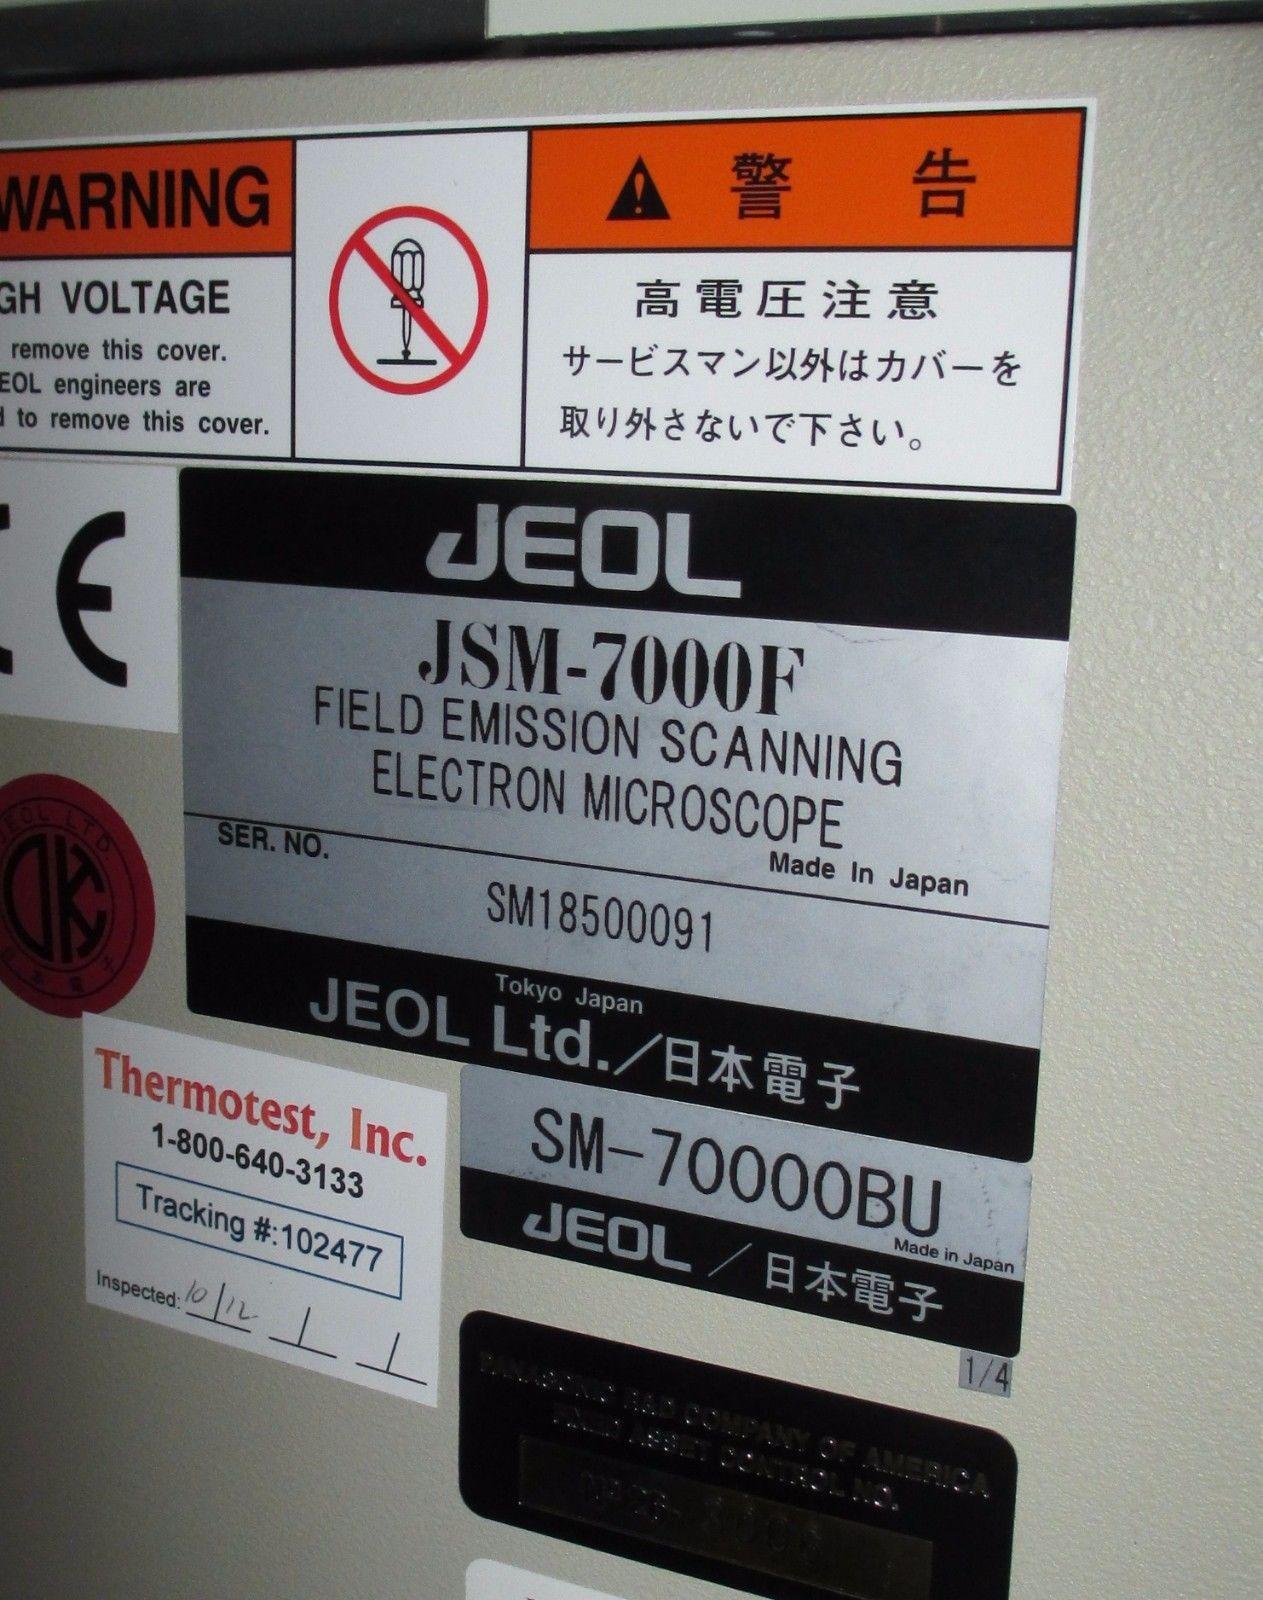 Jeol JSM 7000F SEM Field Emission Scanning Electron Microscope